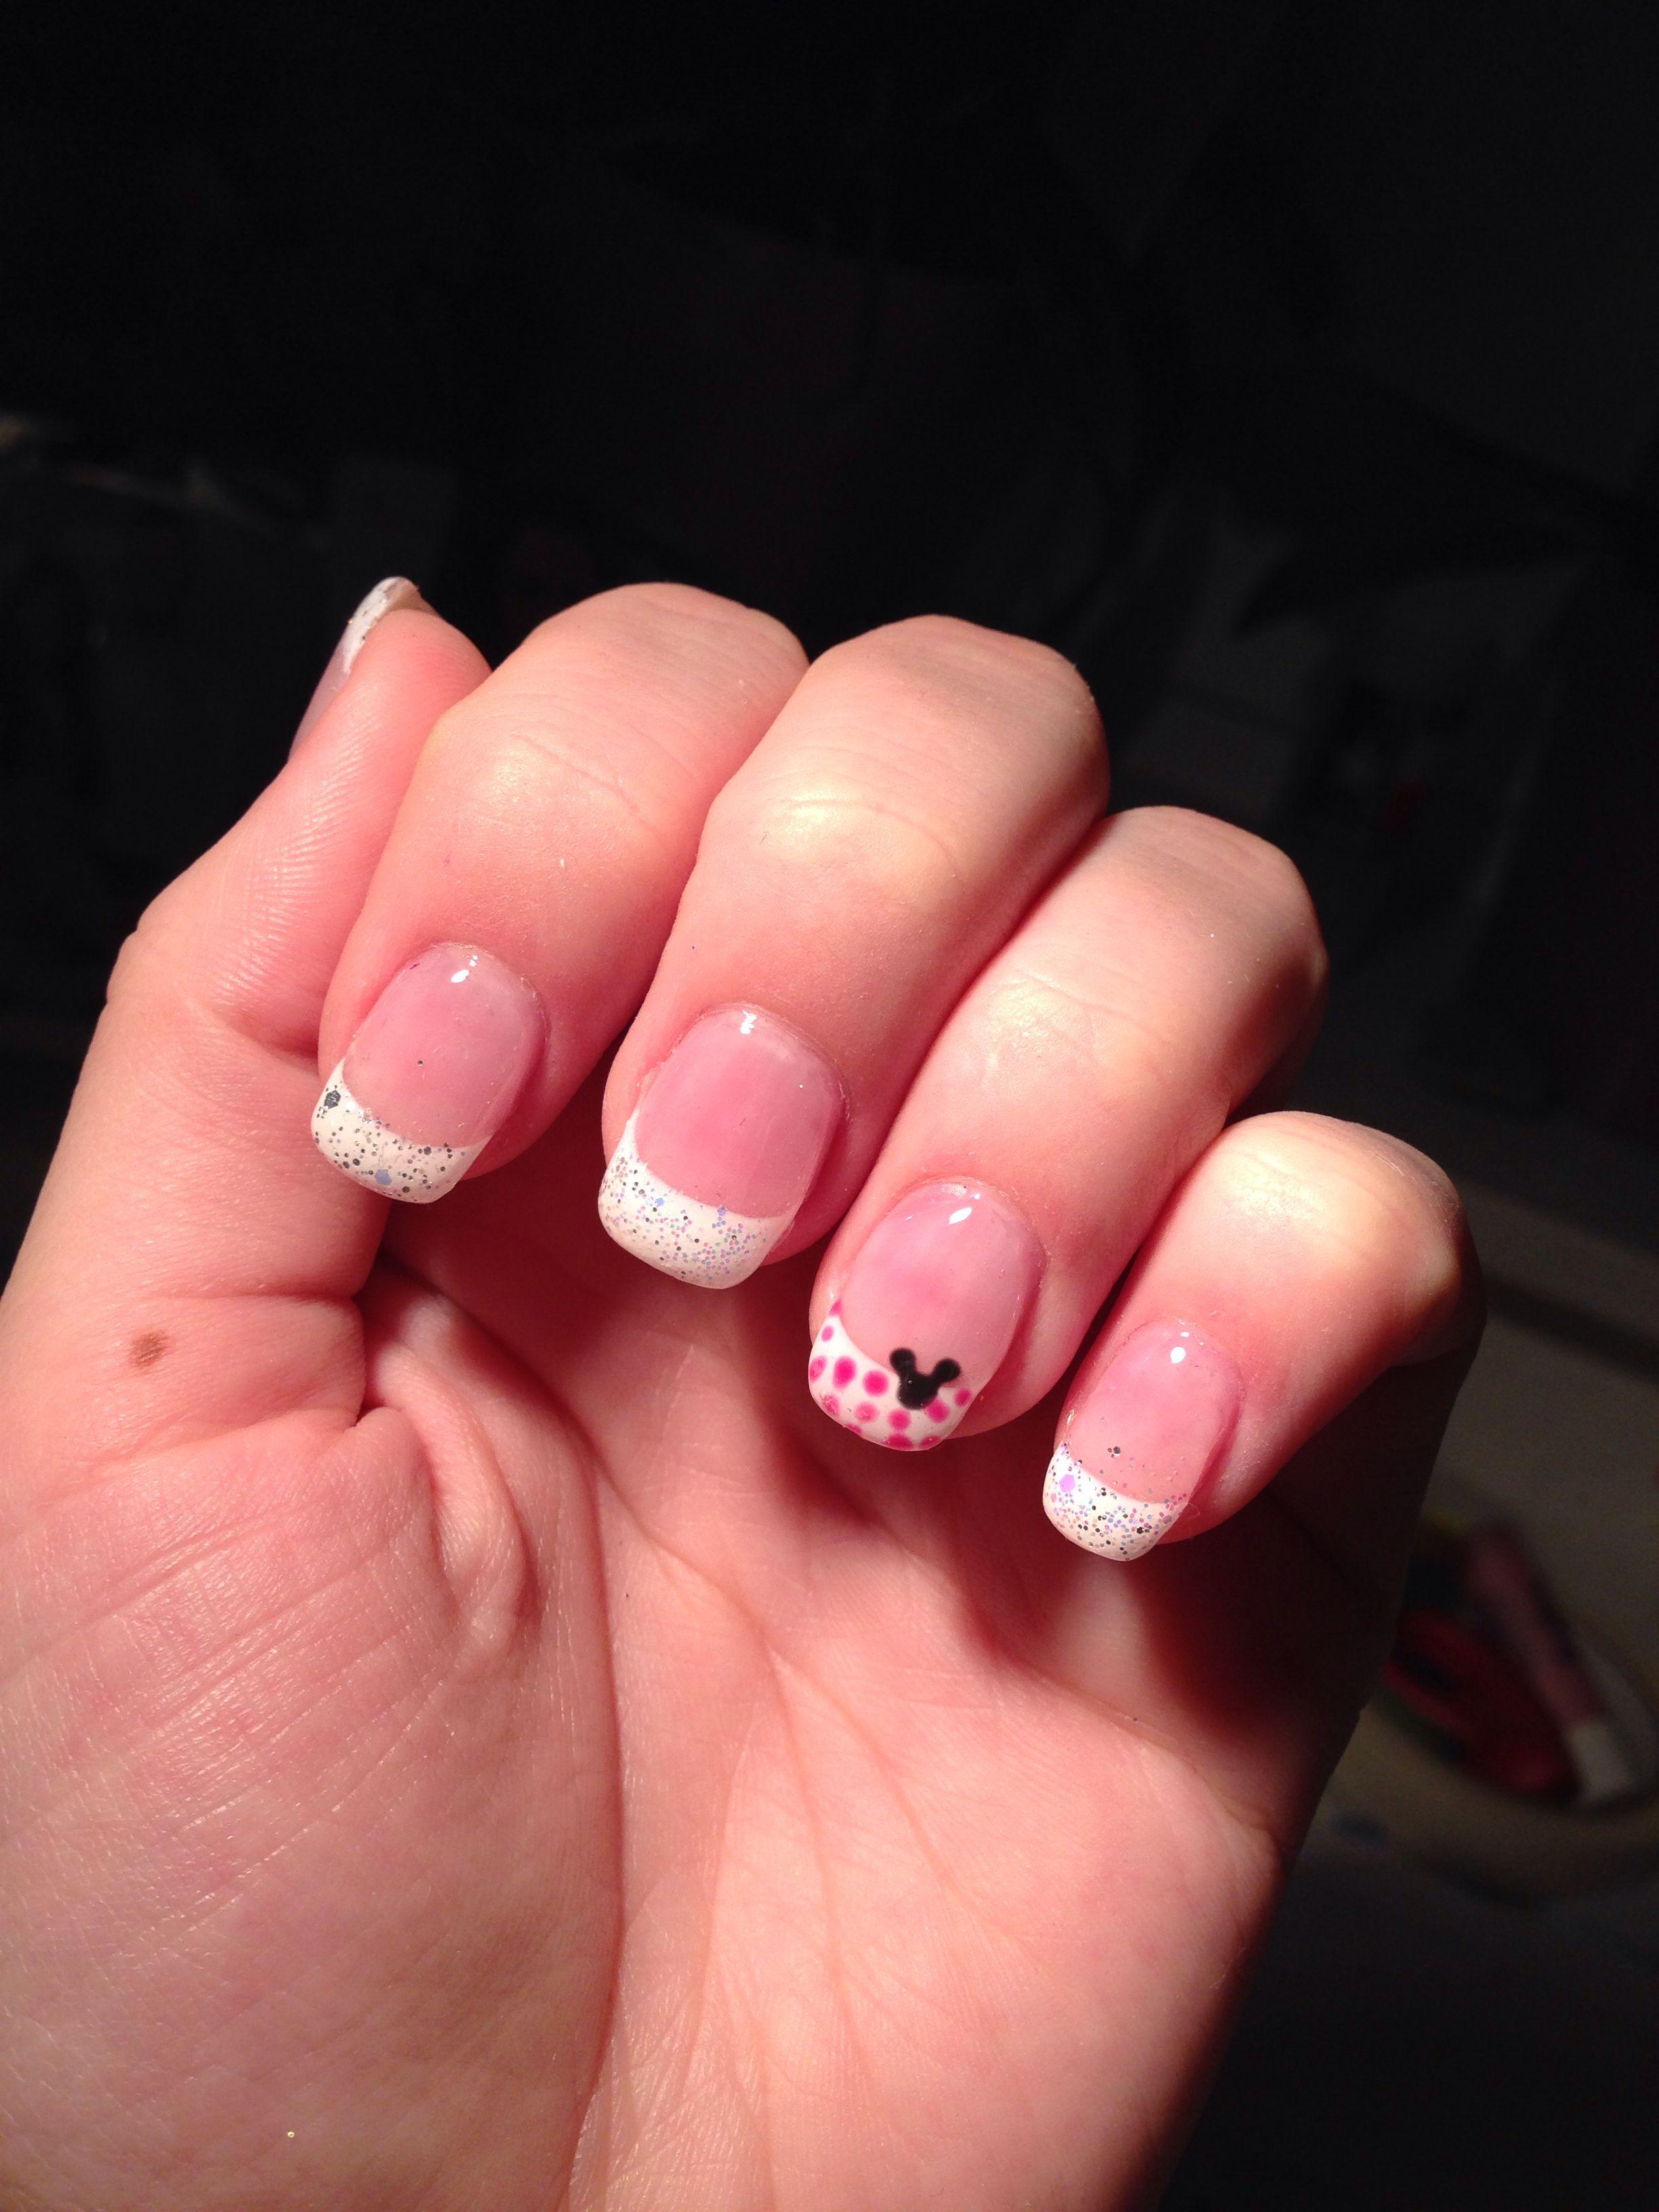 Mickey mouse nails 3.3.14 ; pretty nail shop gel | Meine Gel-Nägel ...